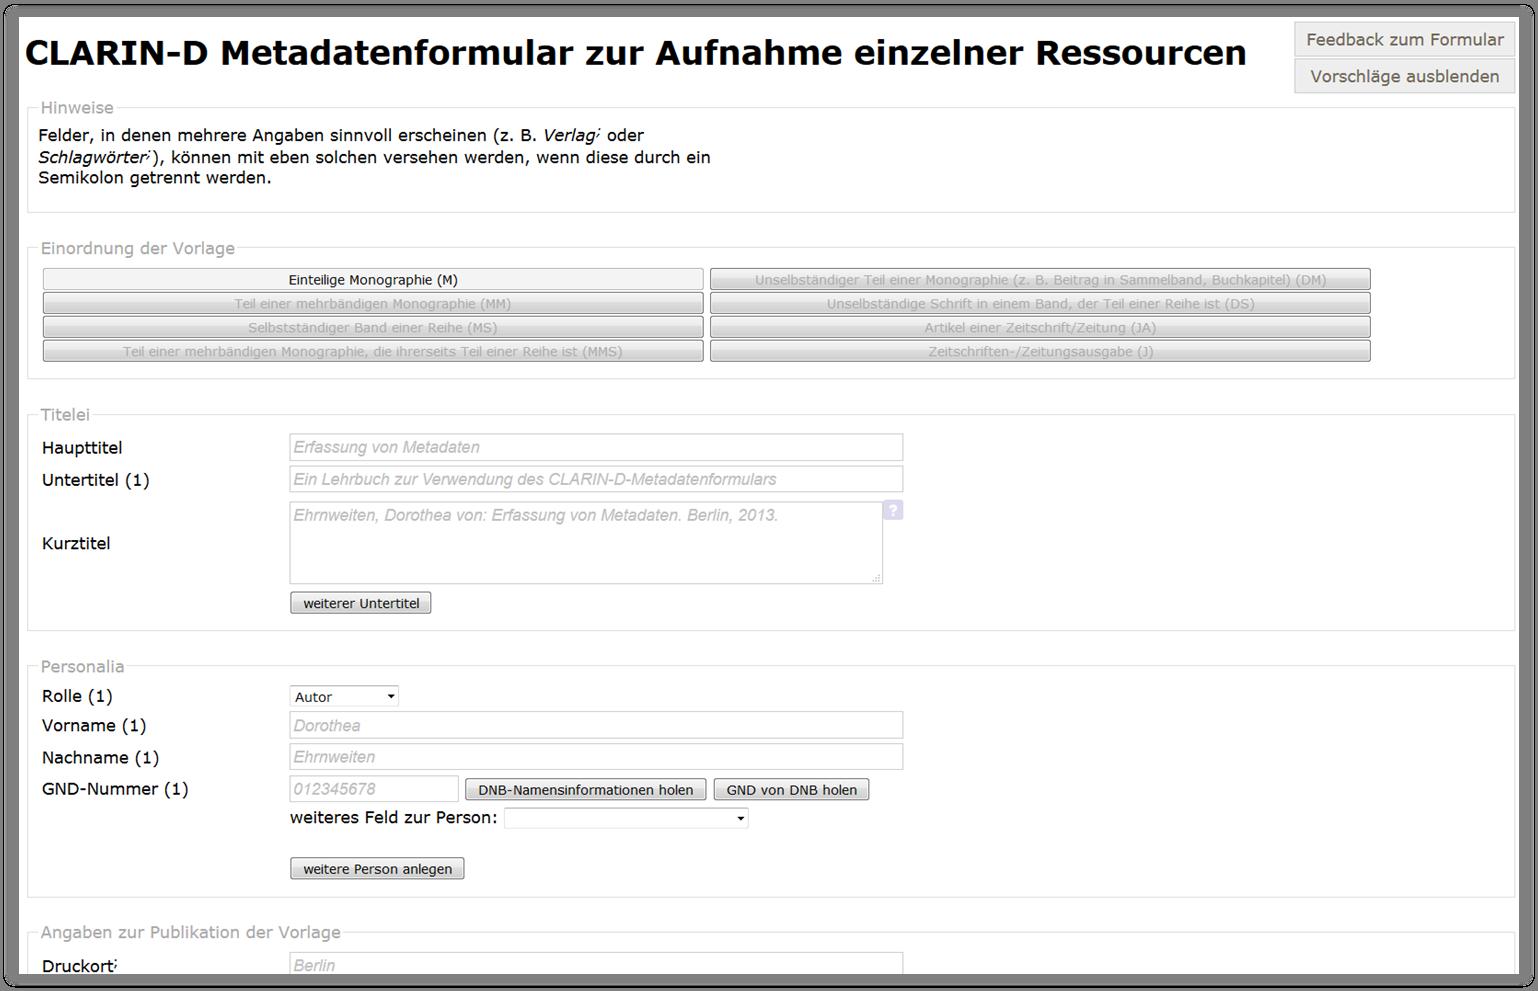 Atemberaubend Webformular Vorlage Fotos - Entry Level Resume ...